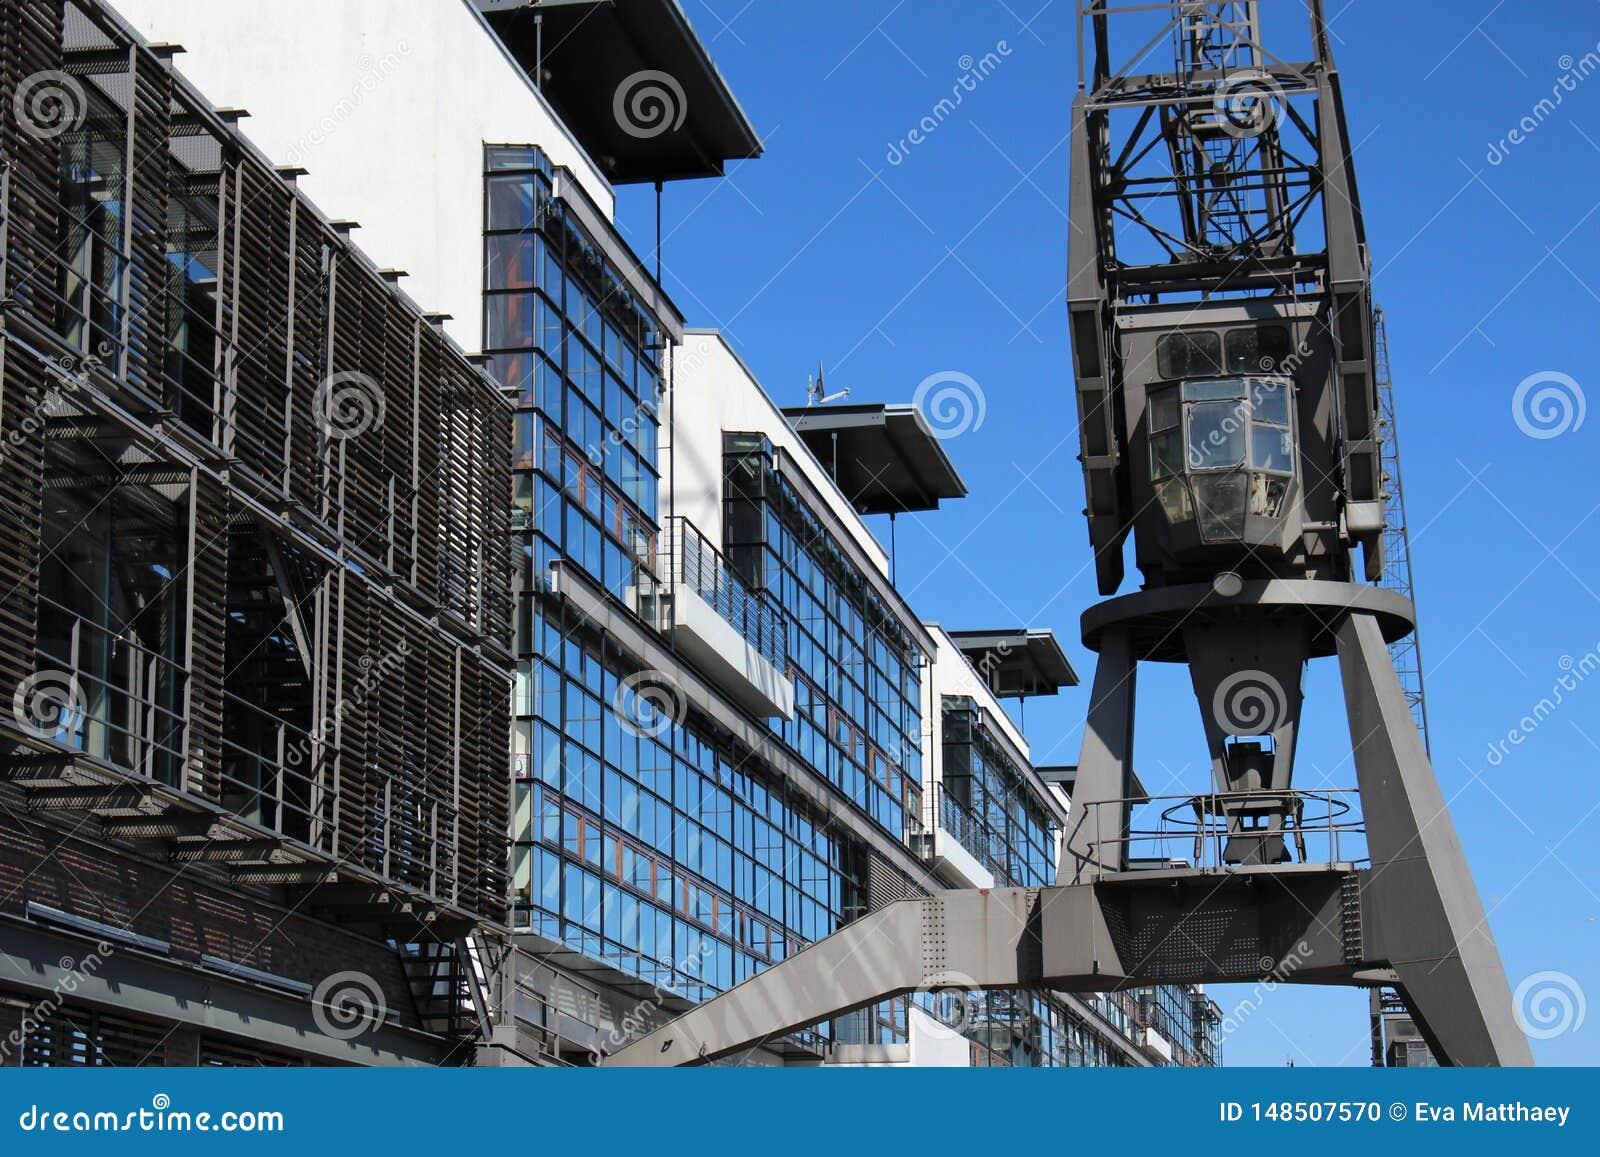 Historical harbor cranes at the Port of Hamburg